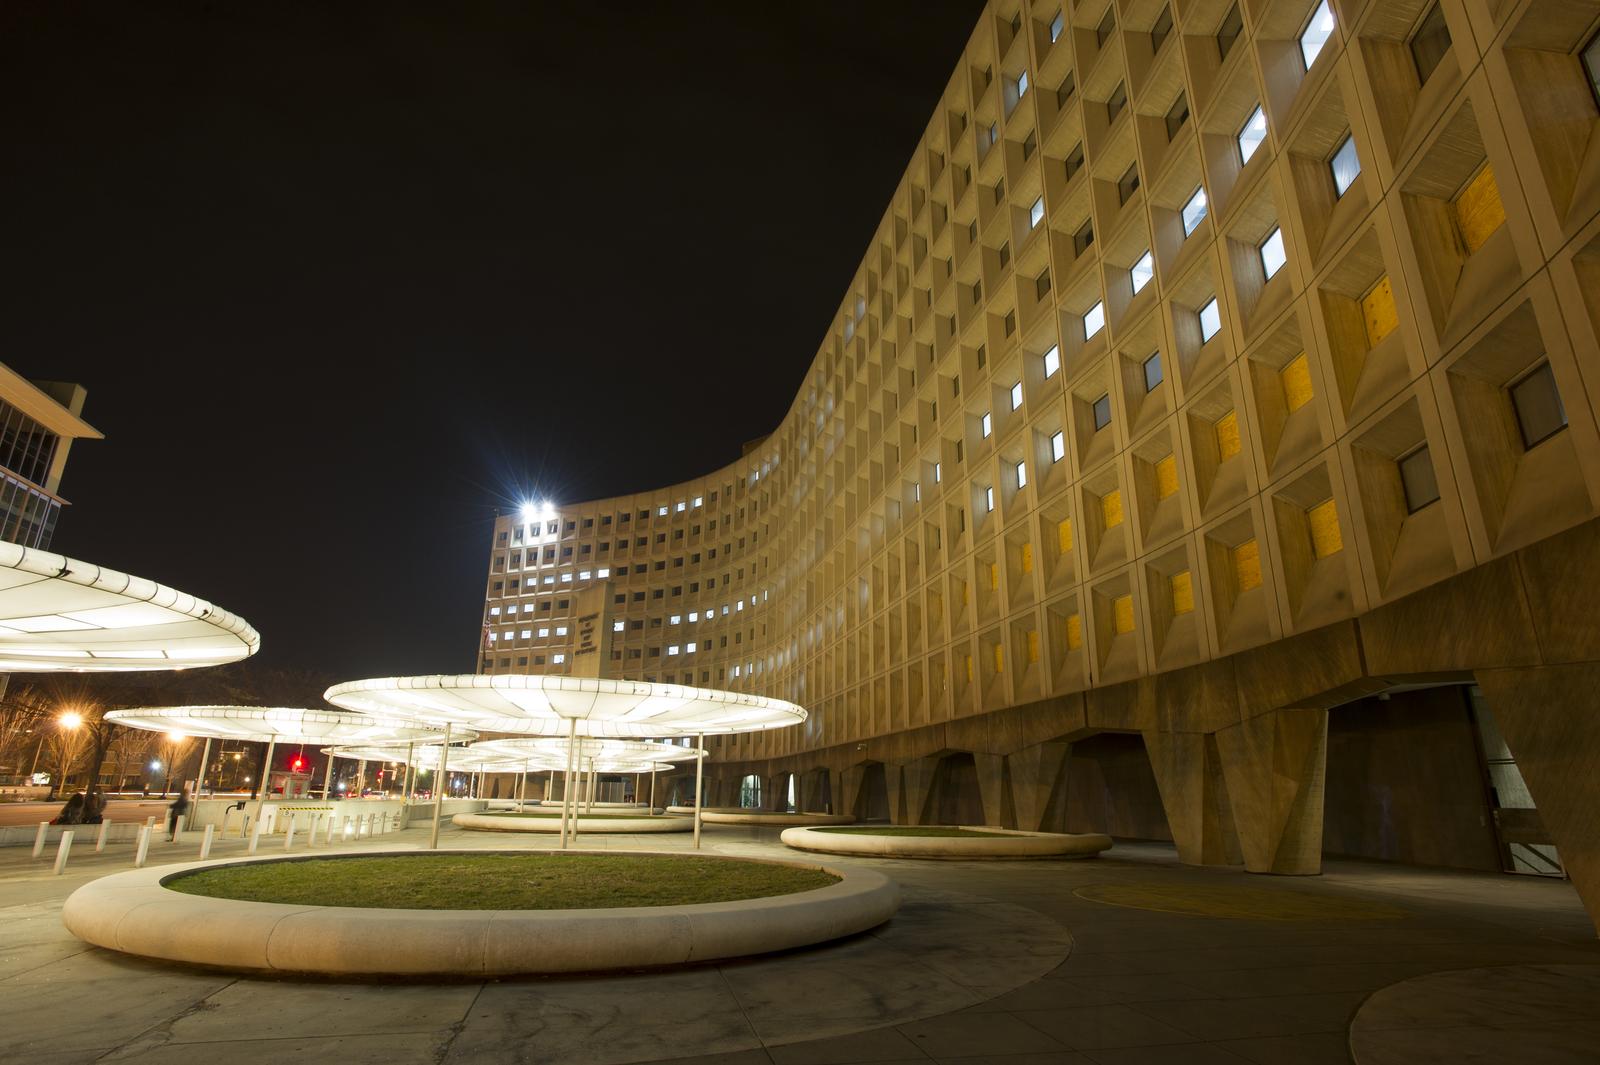 HUD headquarters building at night:  Robert C. Weaver Federal Building